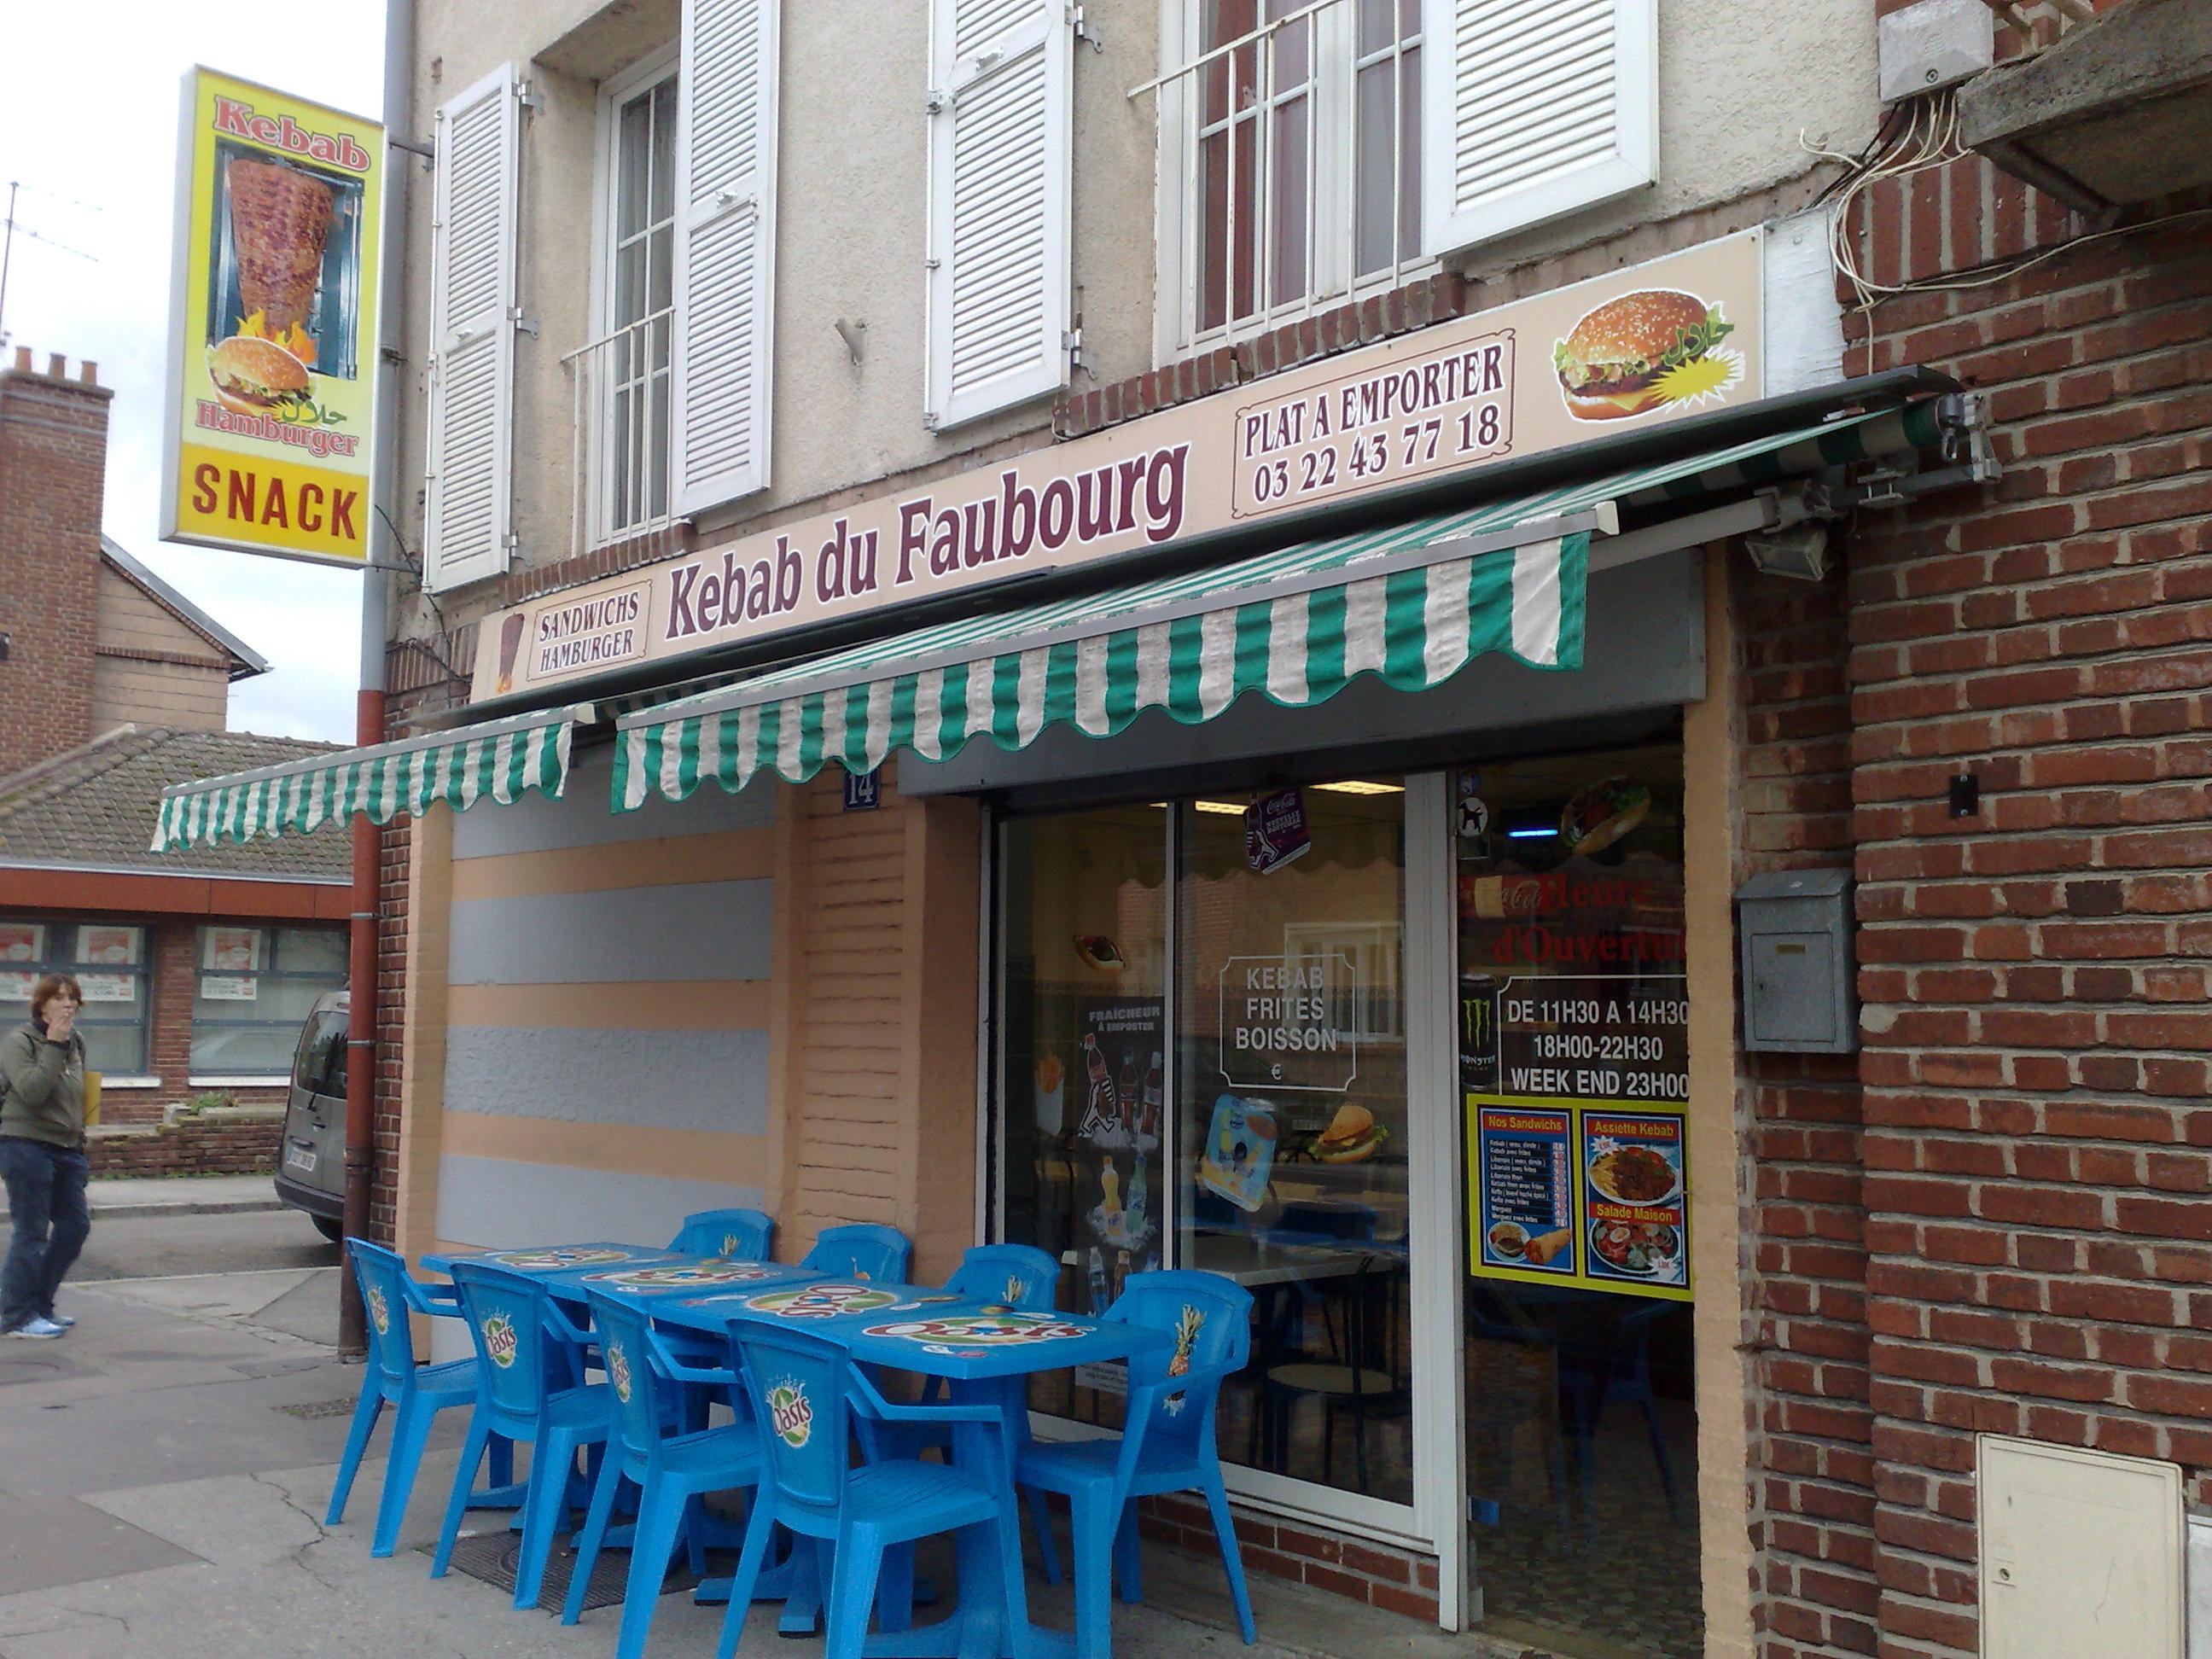 Kebab du faubourg